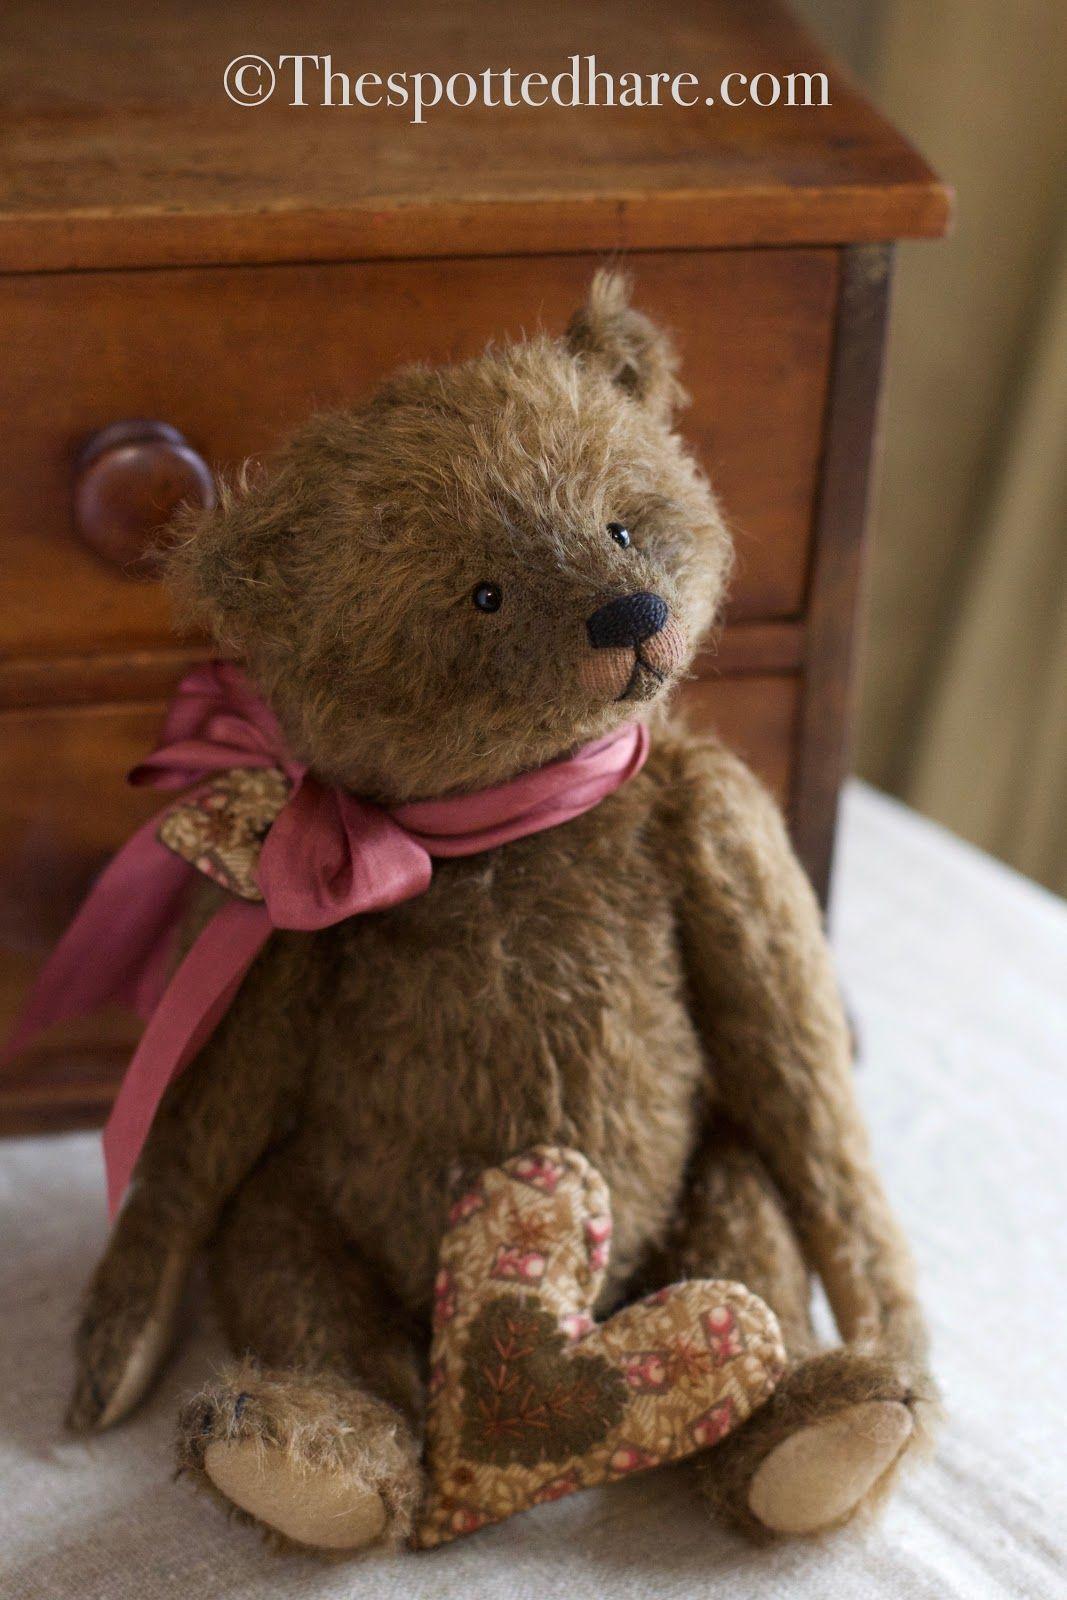 Http Thespottedharegallery Blogspot Com Old Teddy Bears Teddy Bear Plush Teddy Bear Pattern